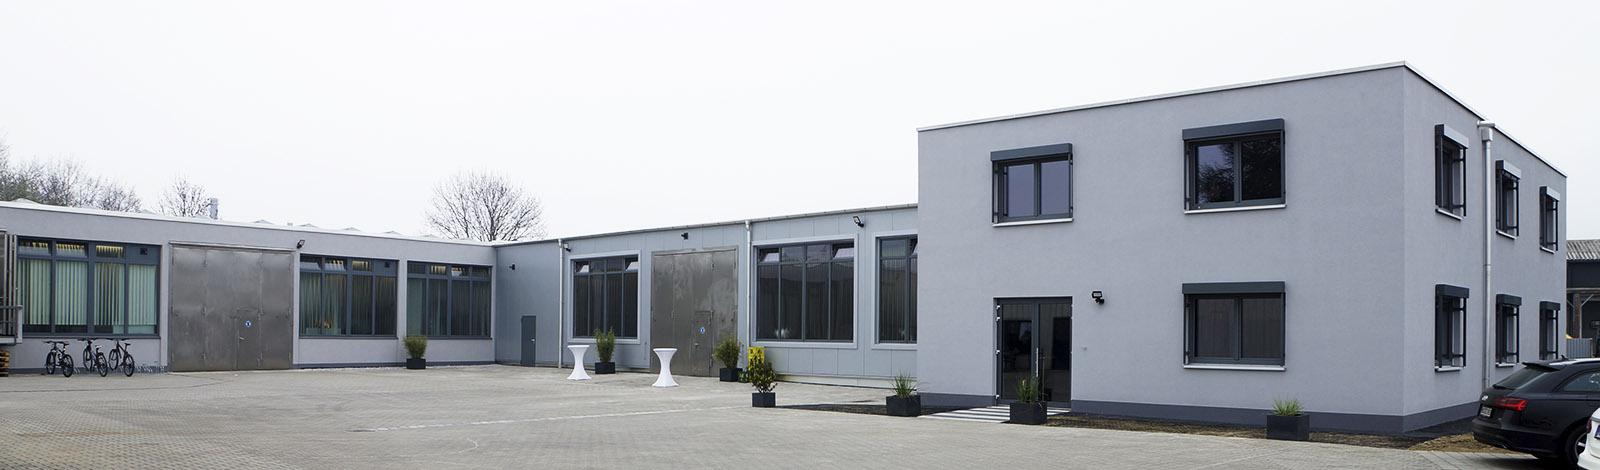 Seifert Kunststoff GbmH Neu-Ulm Gebäude